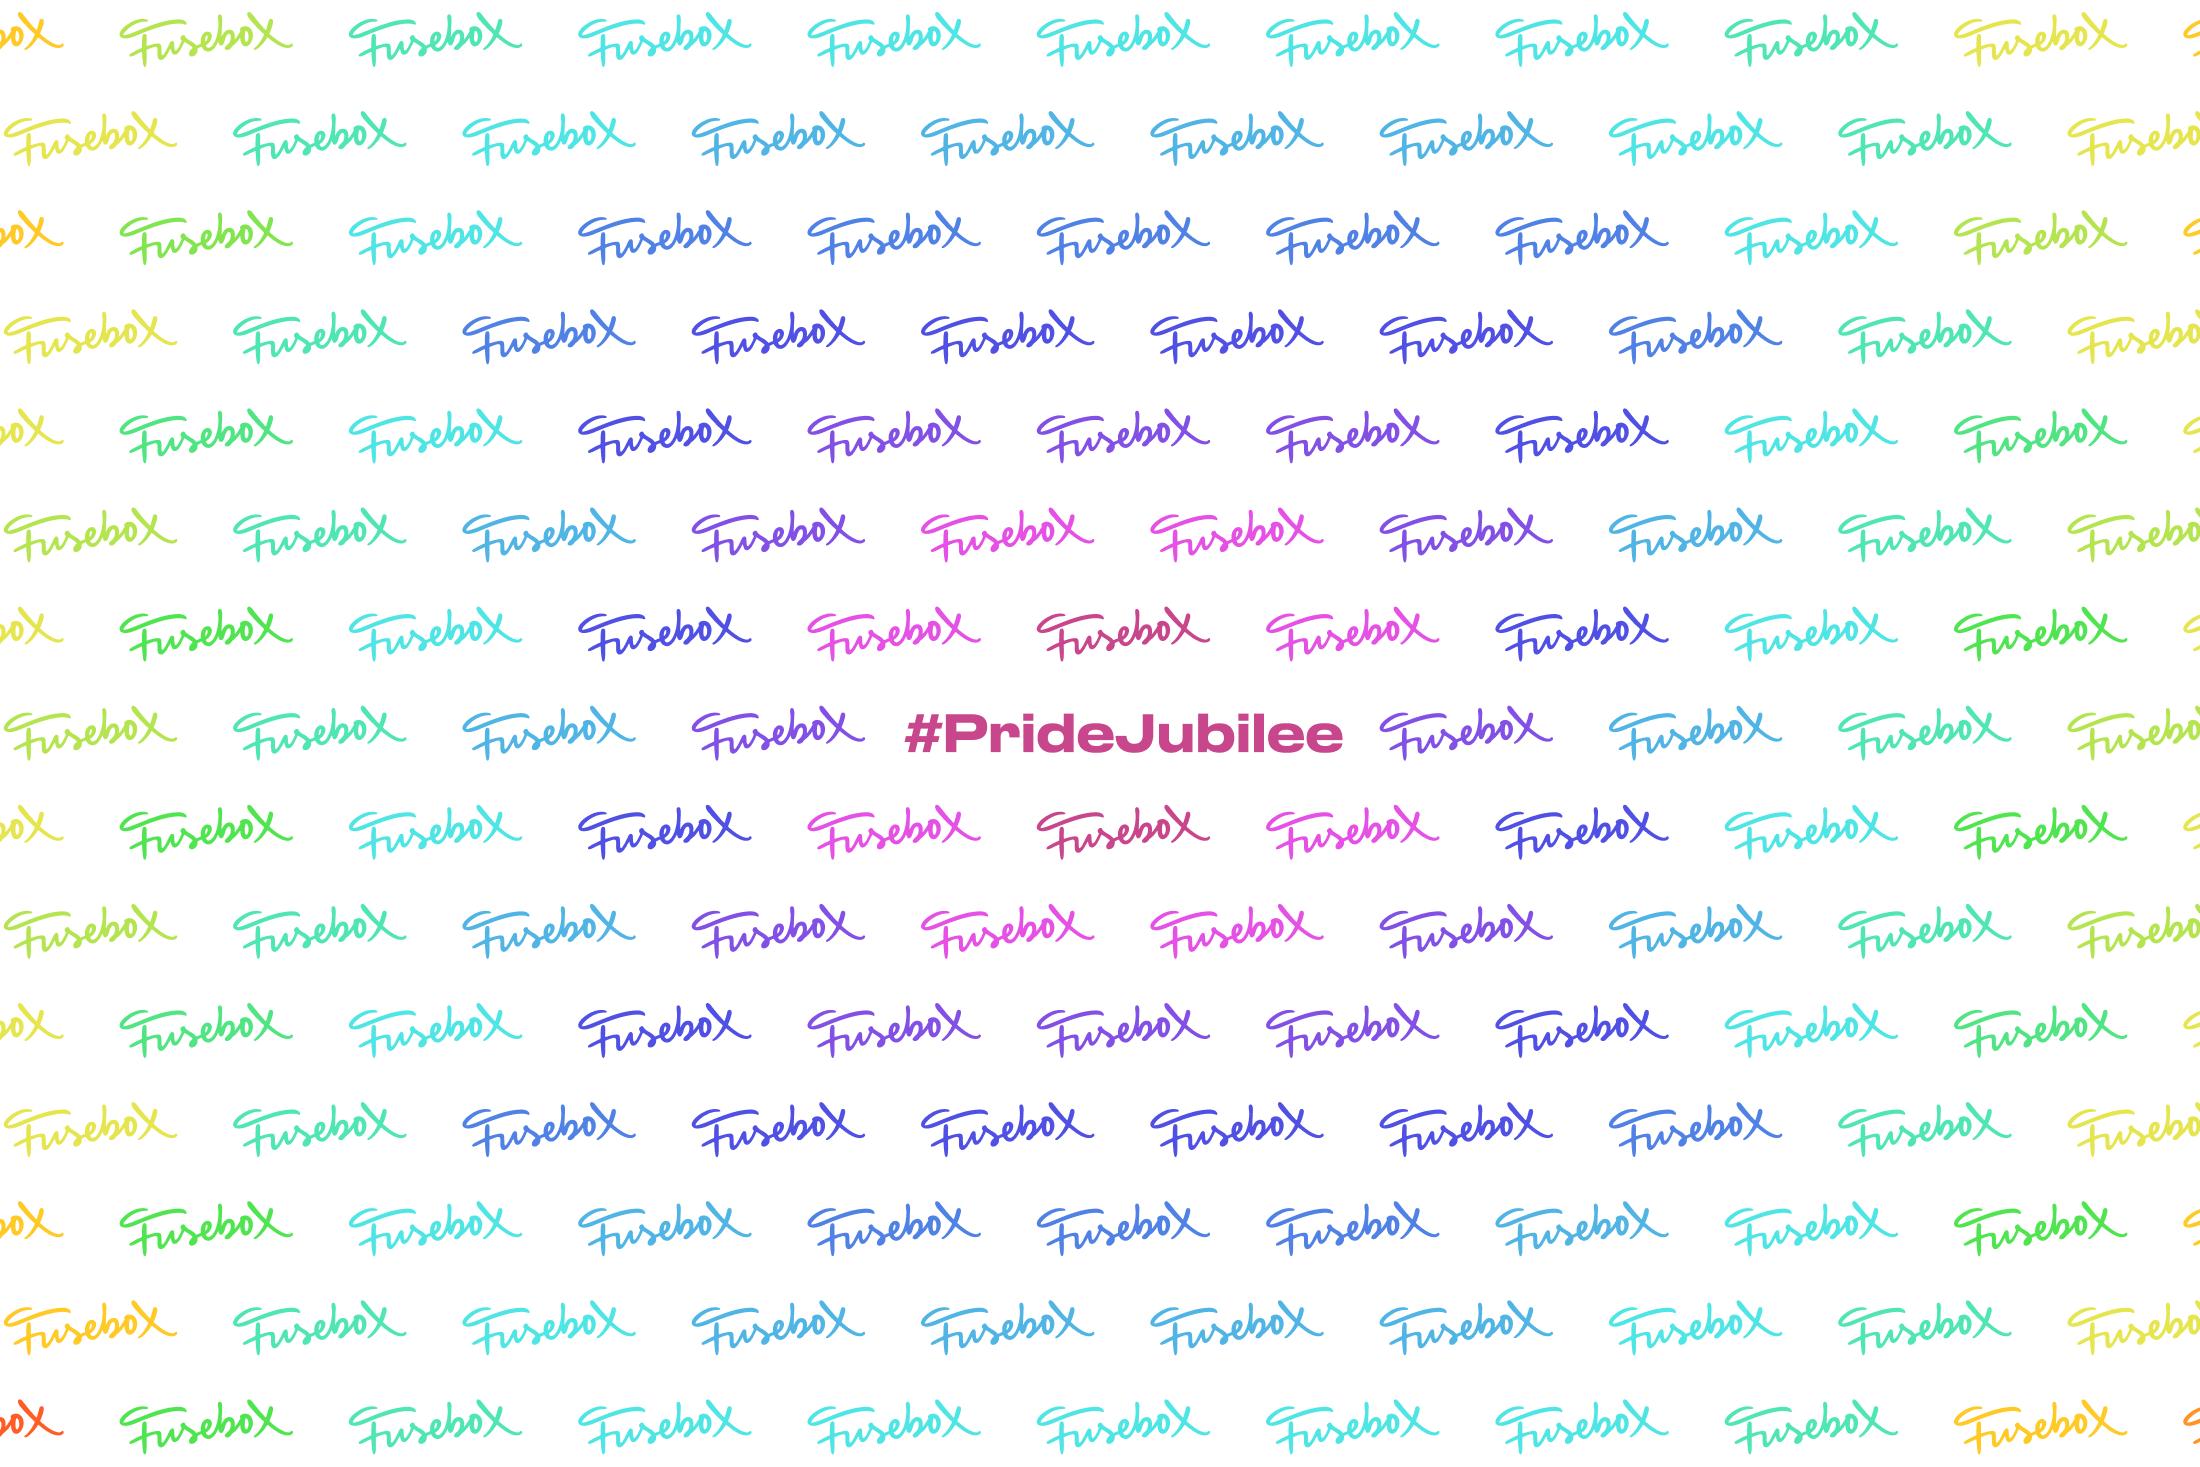 Fusebox logo wall for Pride Jubilee